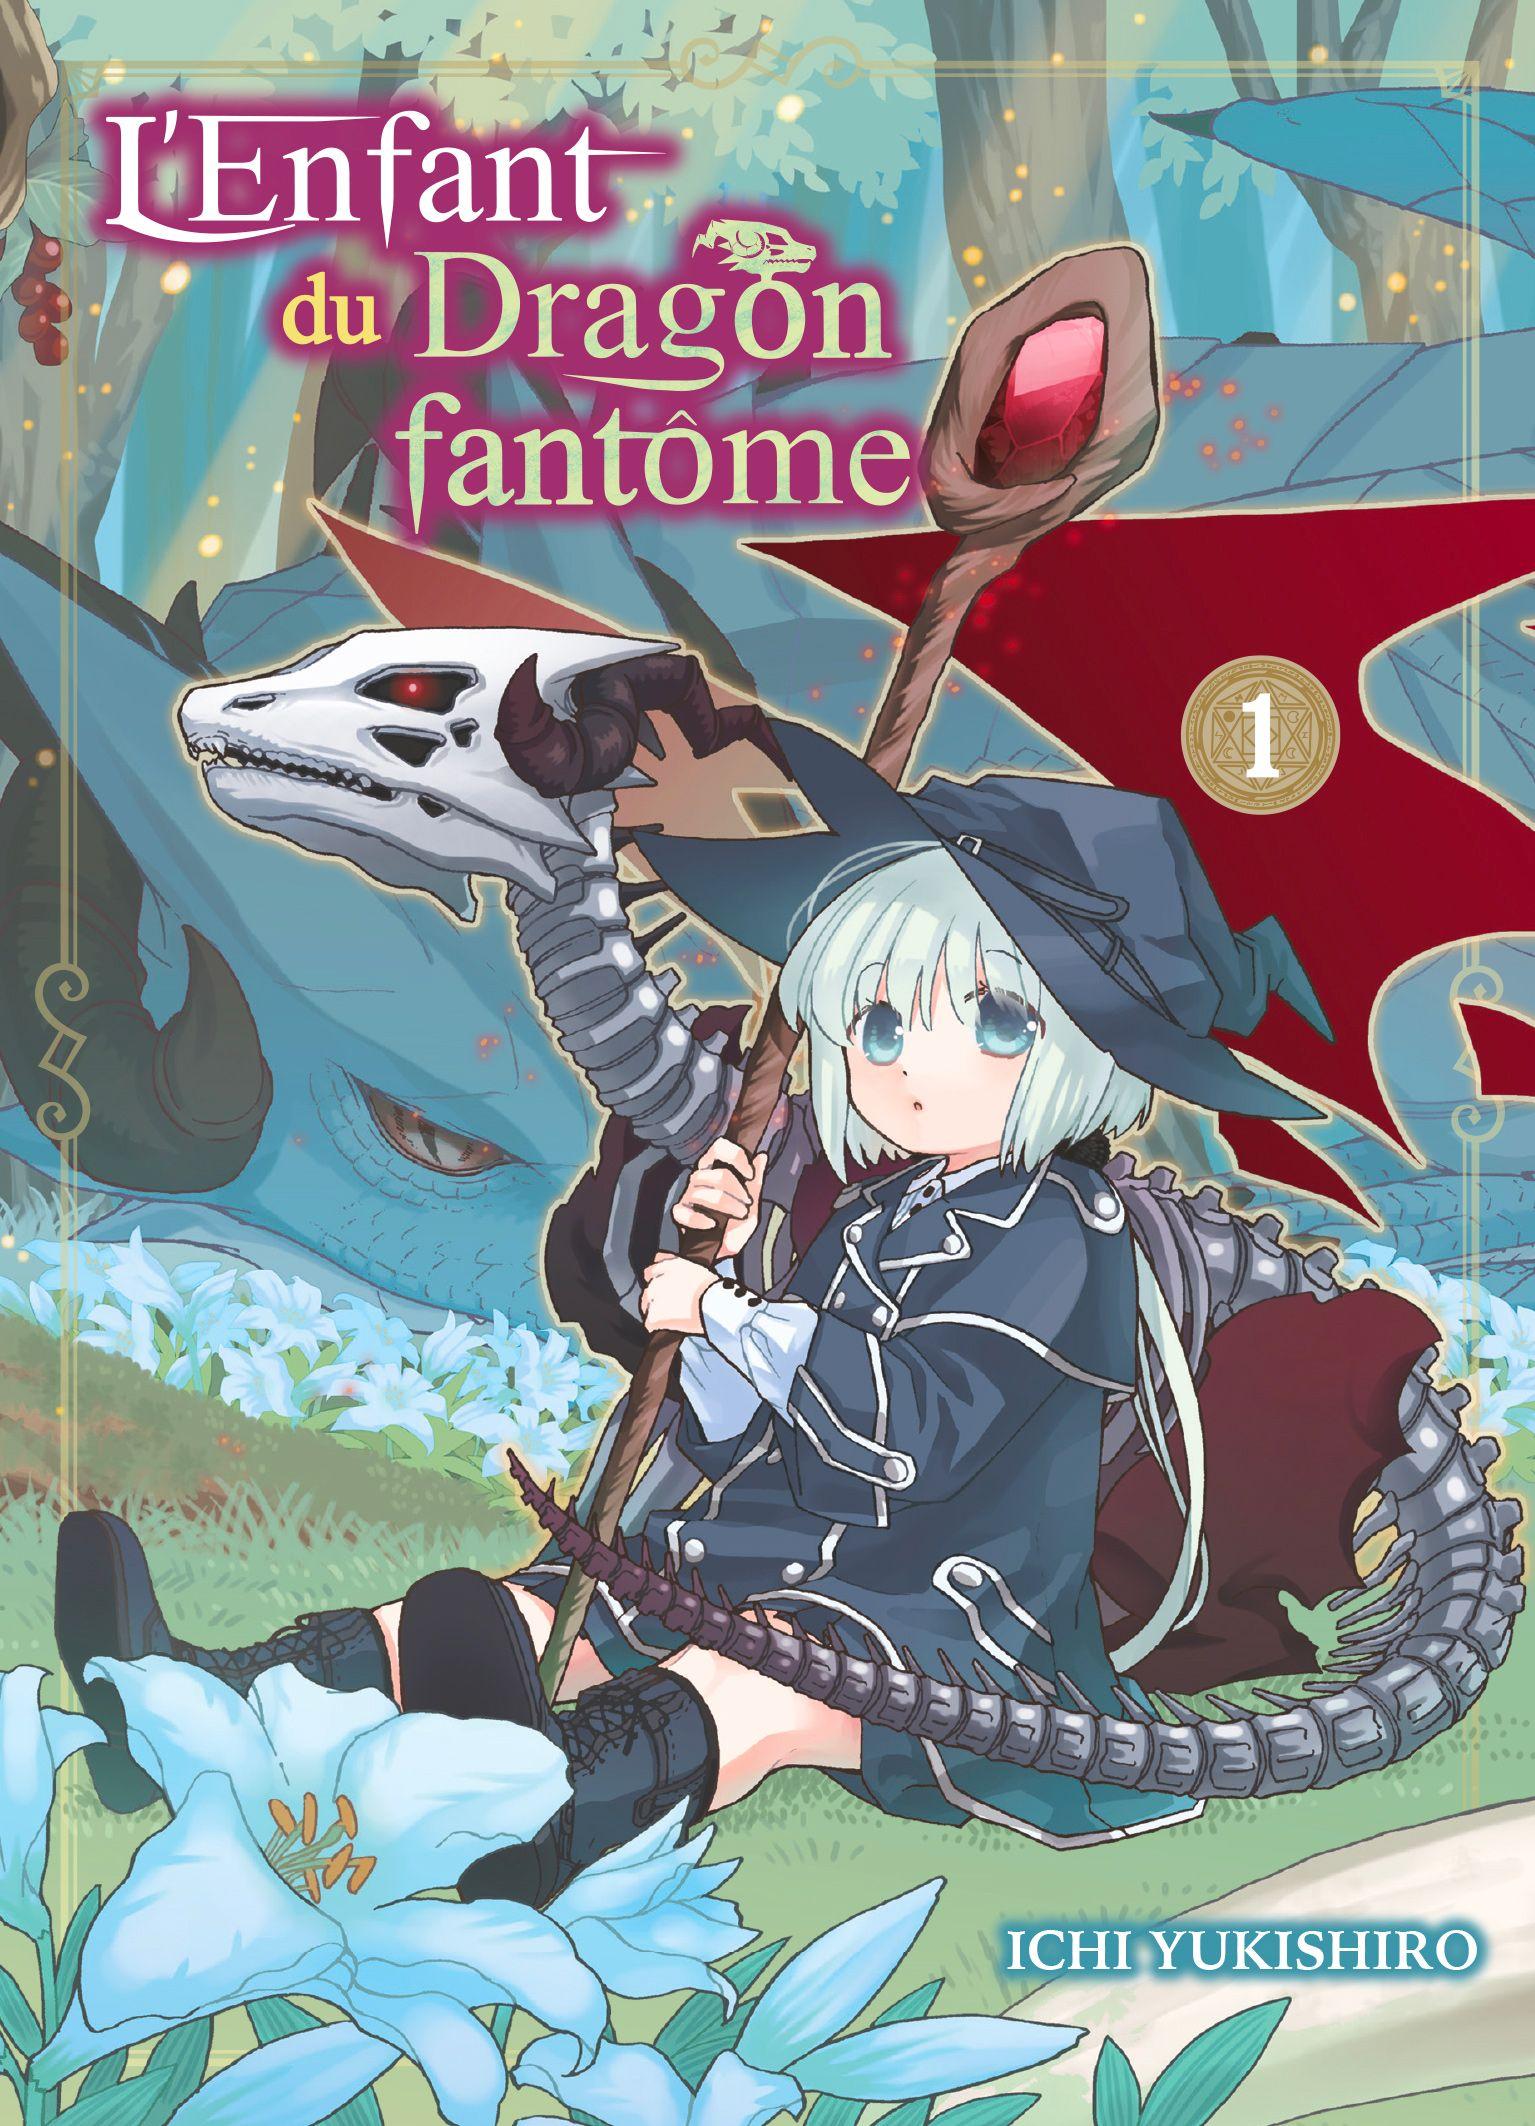 Sortie Manga au Québec JUILLET 2021 Enfant-dragon-fantome-1-komikku